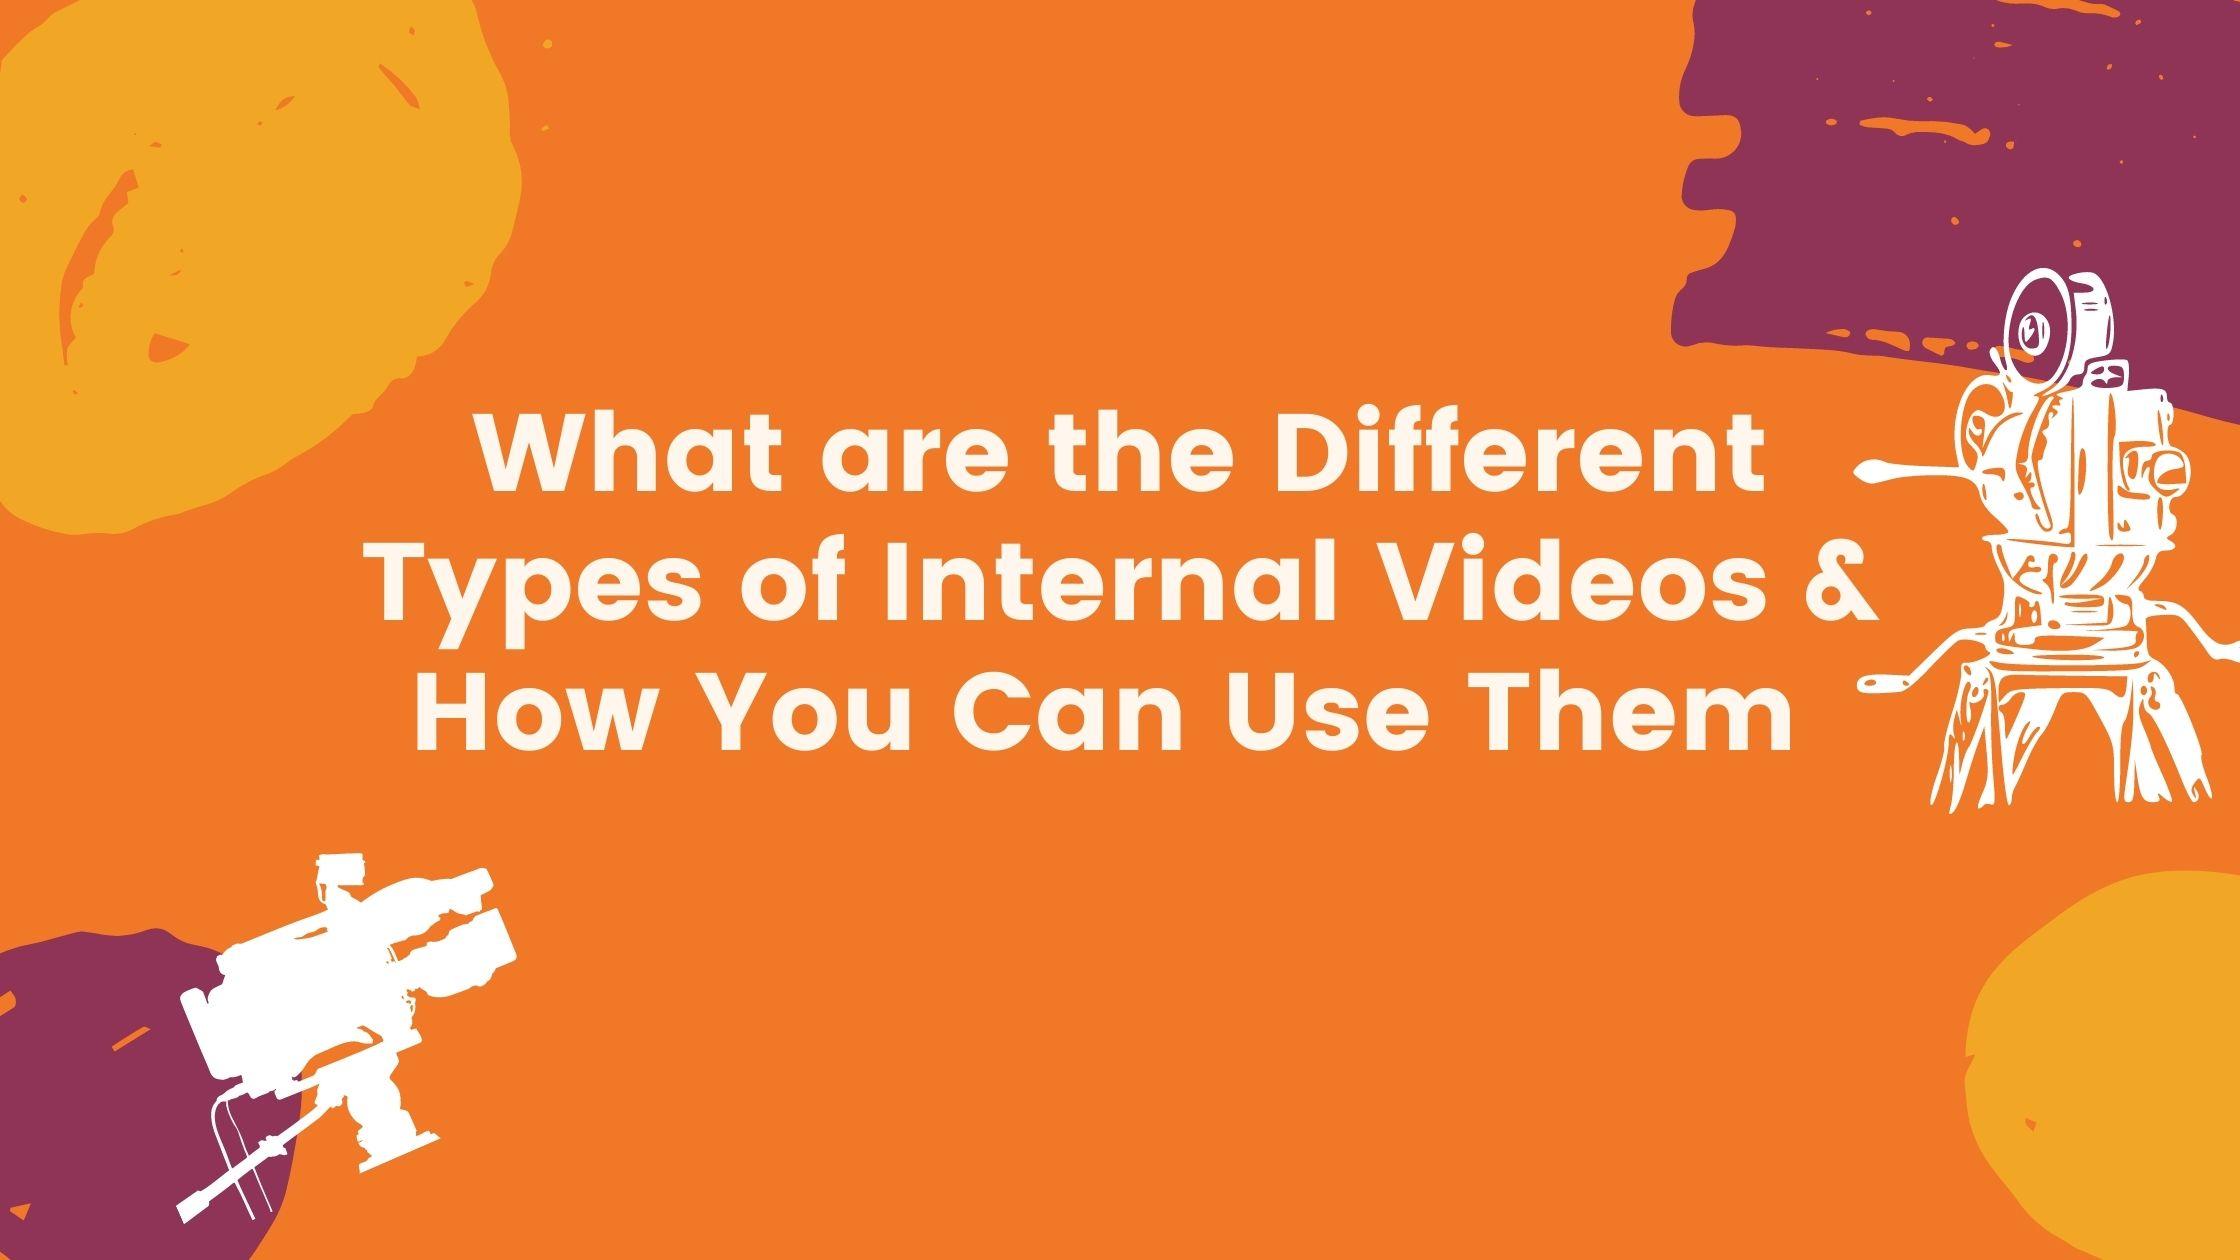 Internal Videos